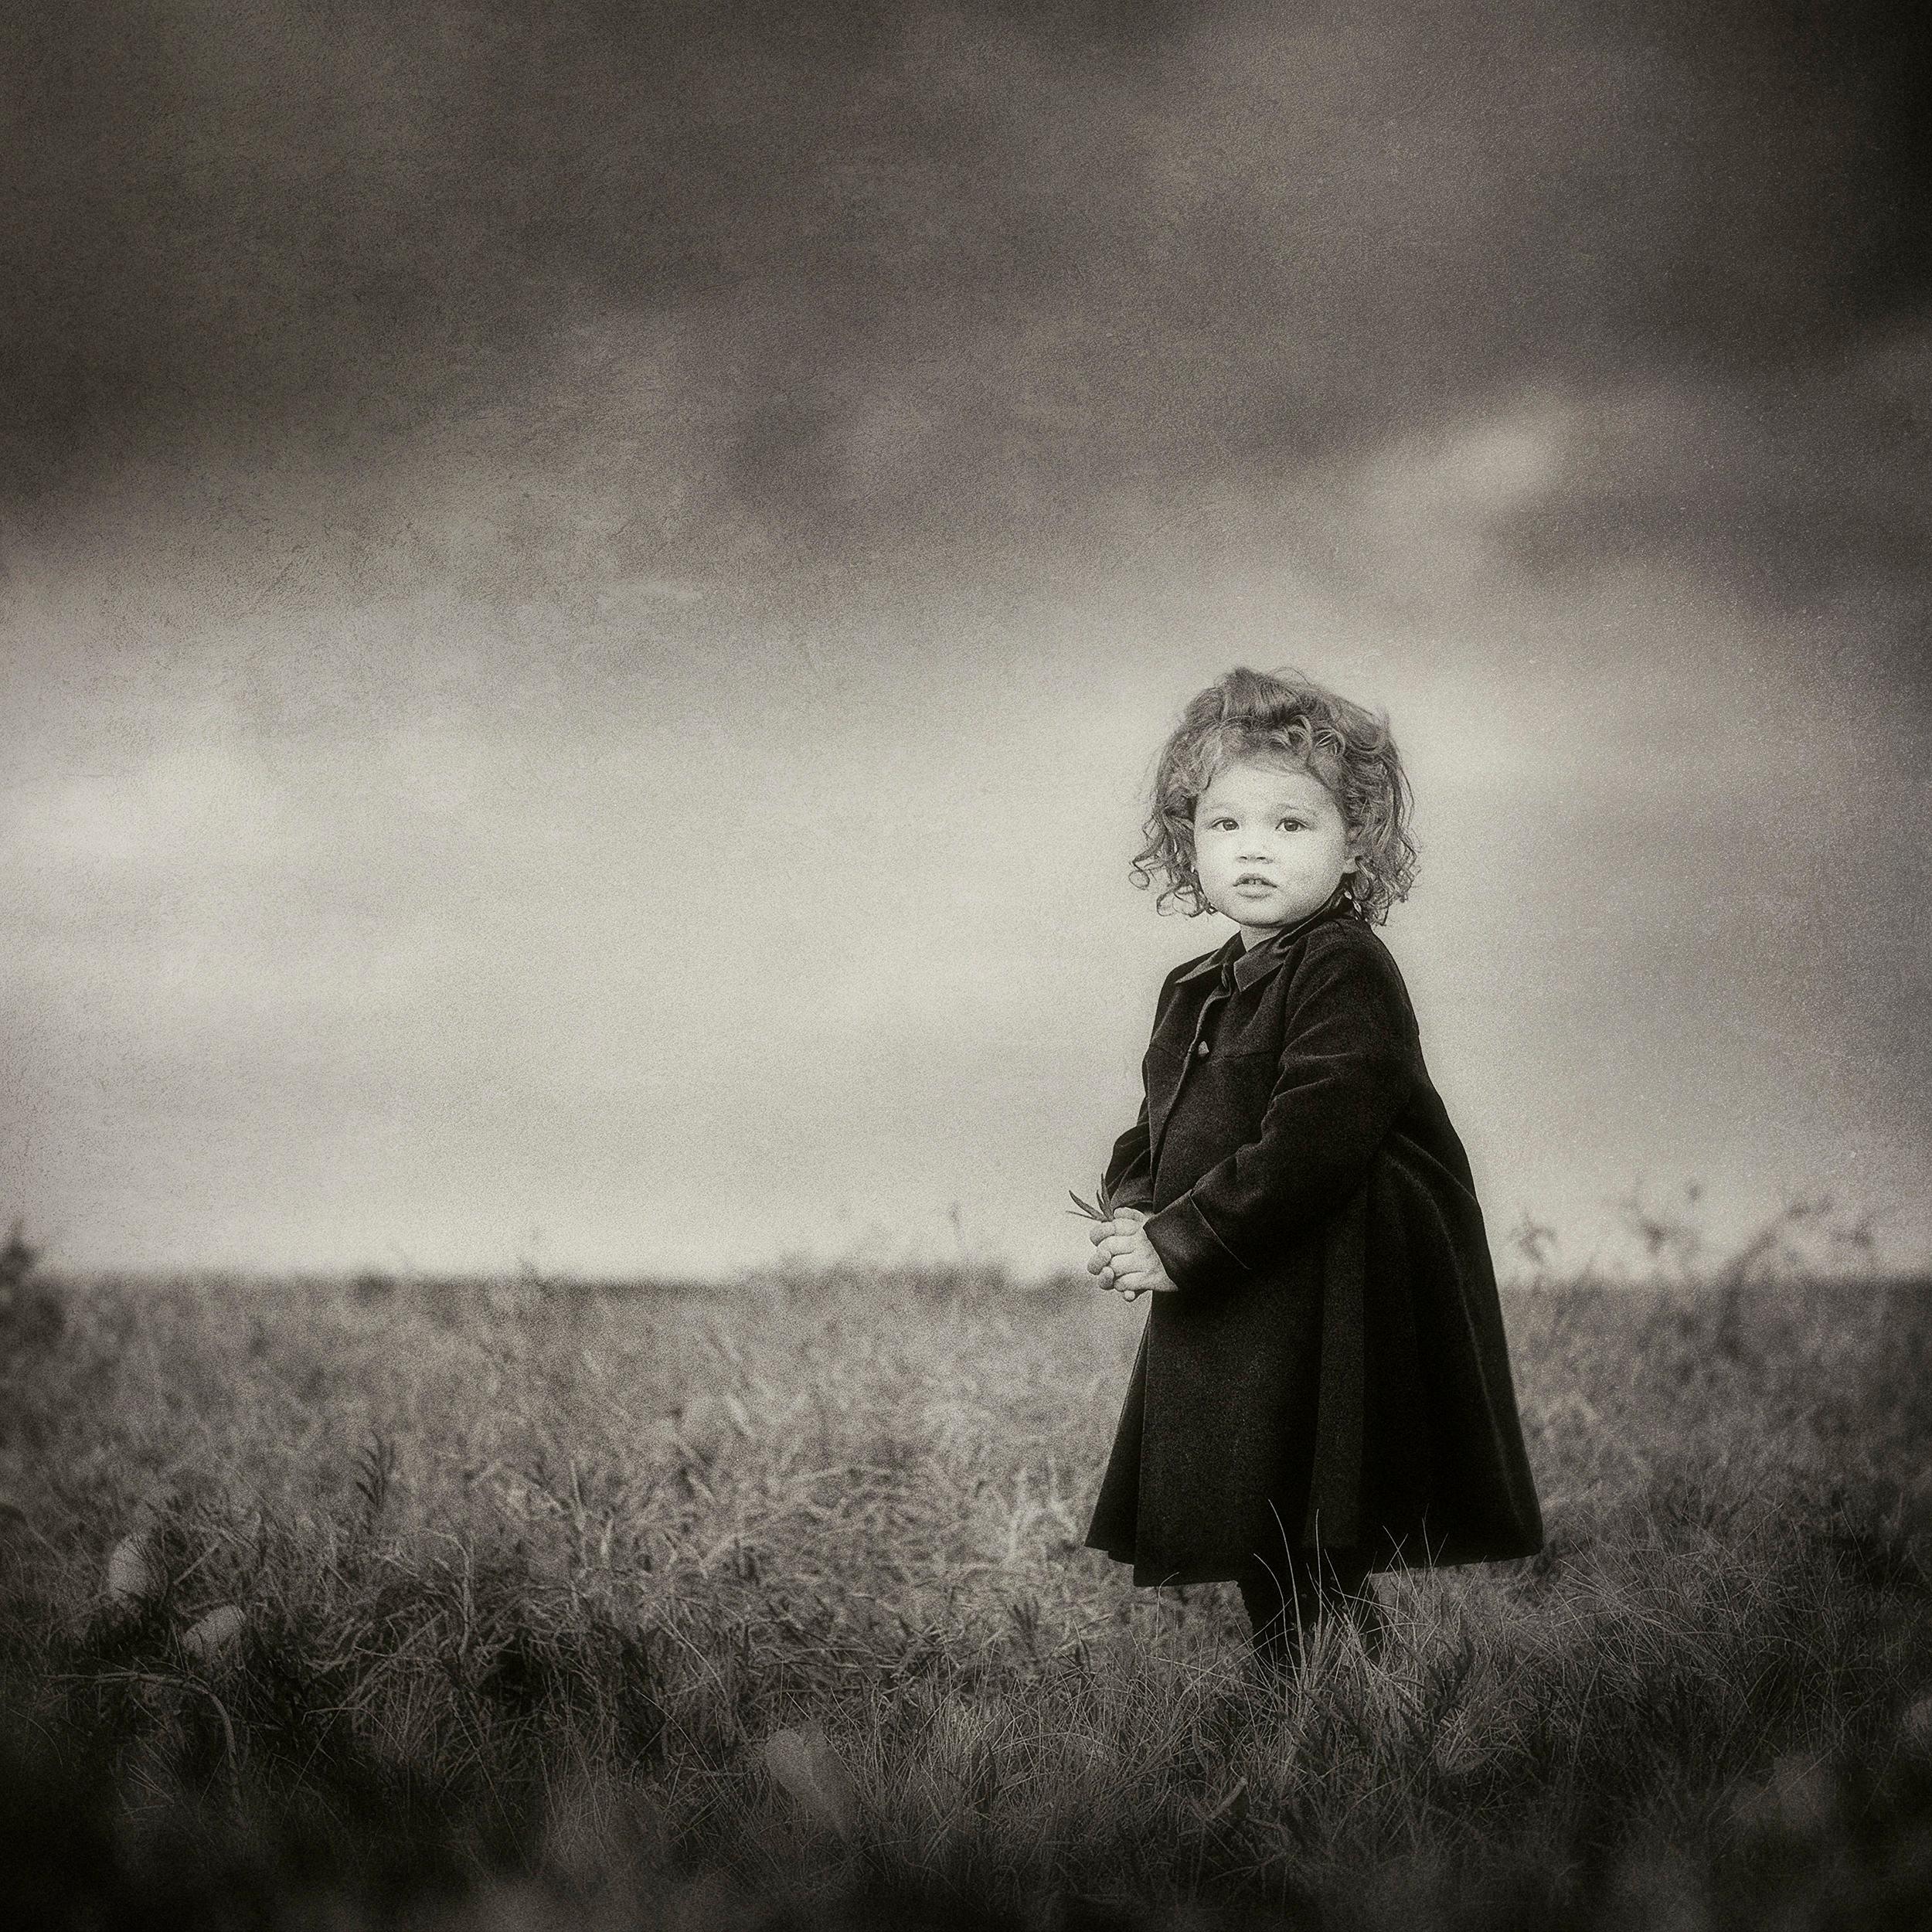 Gallery-girl-beach-black-white-portrait-fine-art-portrait.jpg